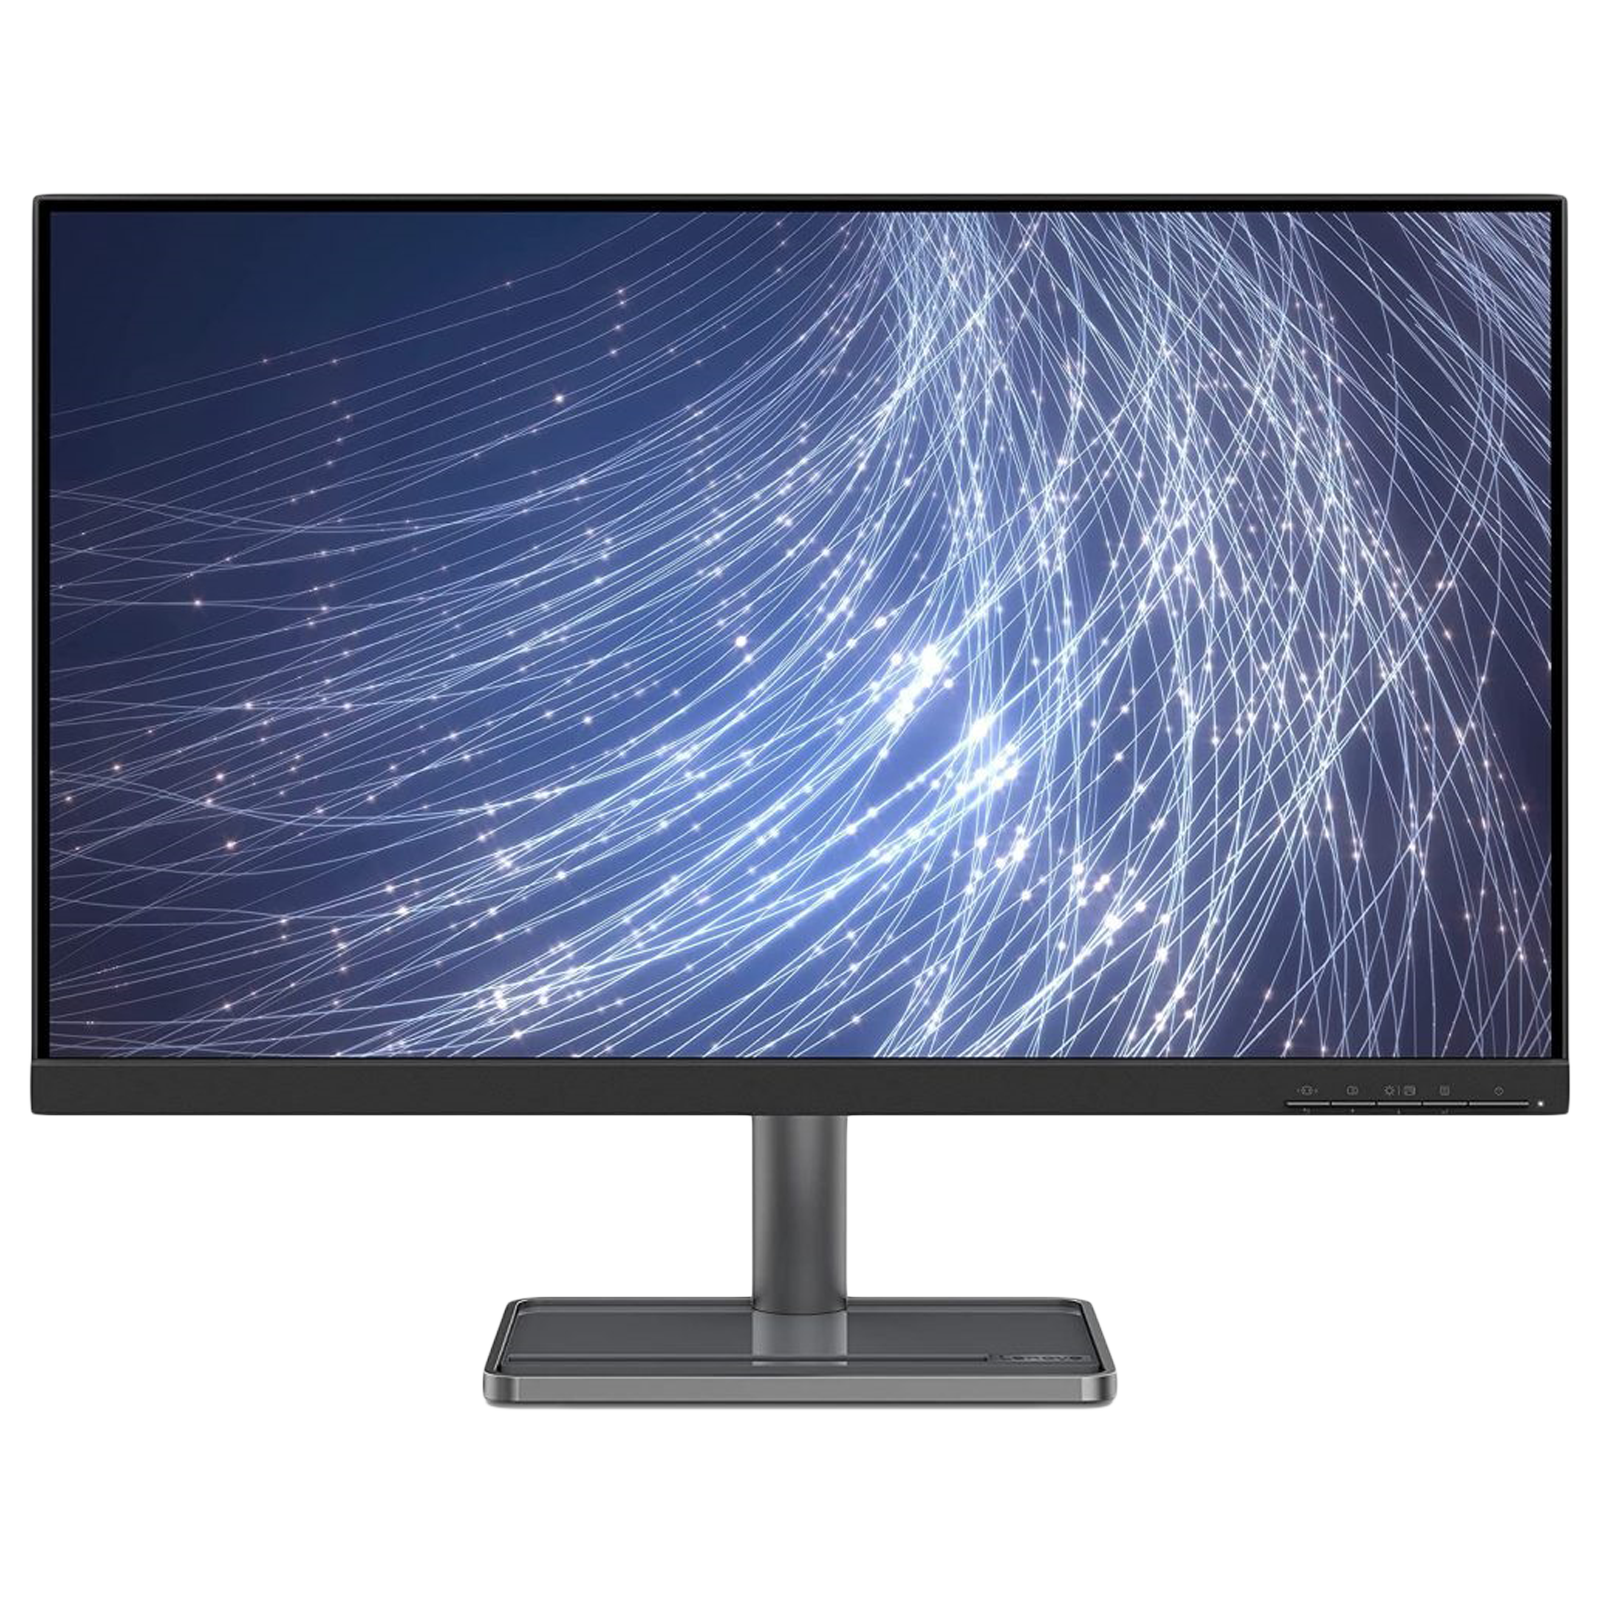 Lenovo L27i-30 68.58cm (27 Inches) Full HD IPS Screen Monitor (AMD FreeSync Technology, HDMI + VGA + Aux, 75 Hz, 66BFKAC2IN, Black)